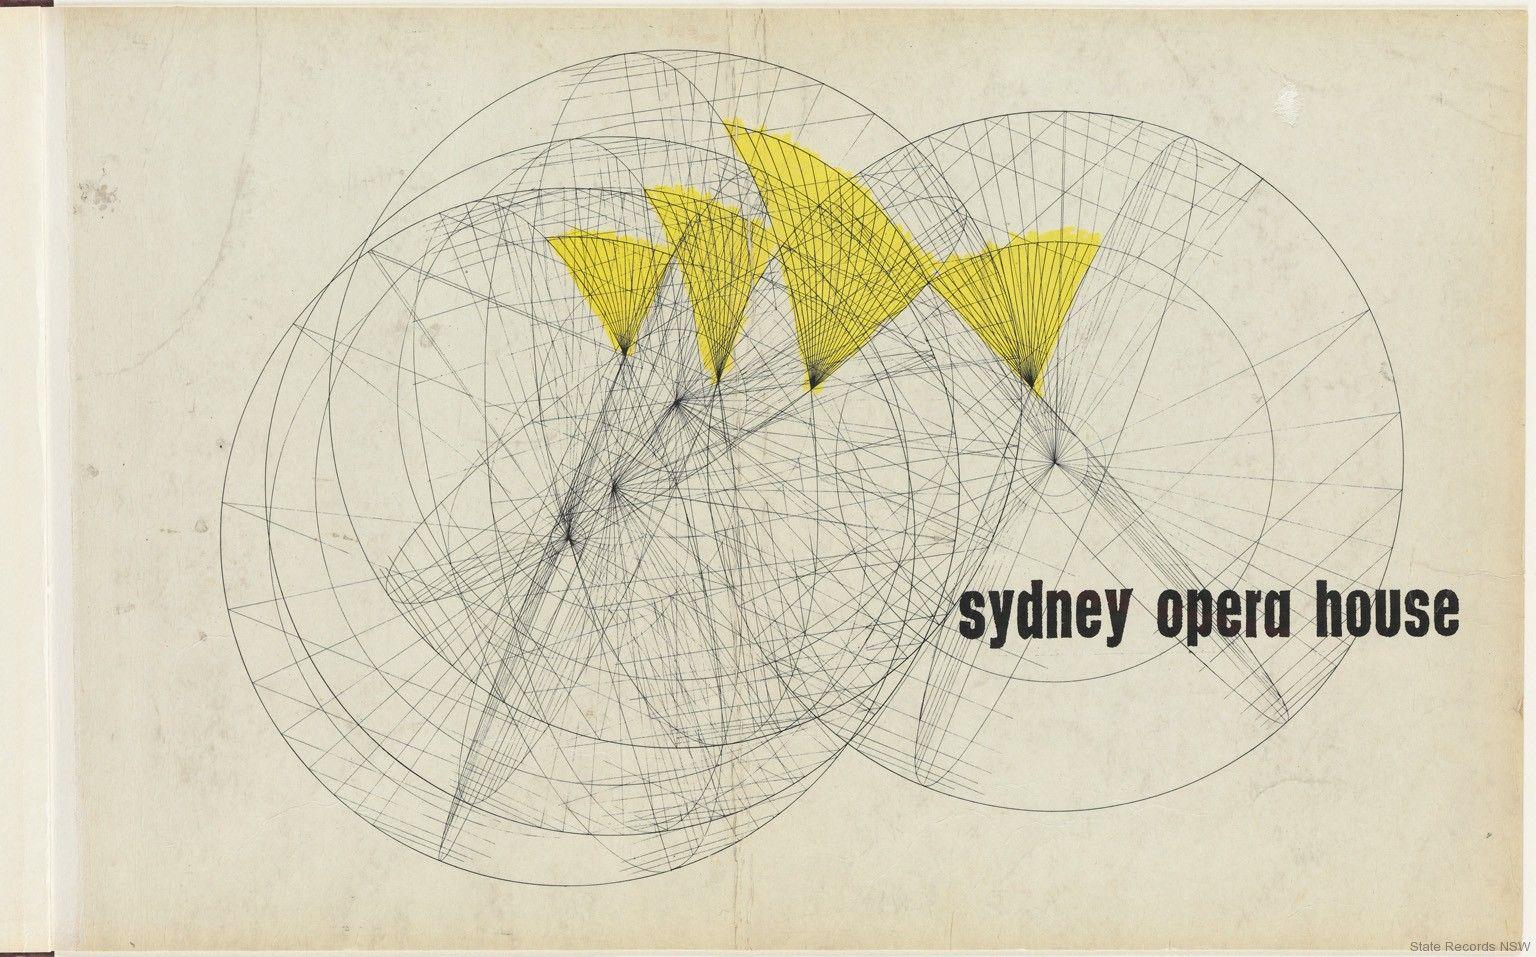 Sydney Opera House (1959 - 1973) Sydney AU.    Architect:Jørn Utzon (1918 – 2008).    Engineers:Ove Arup (1895 – 1988) & Partners.